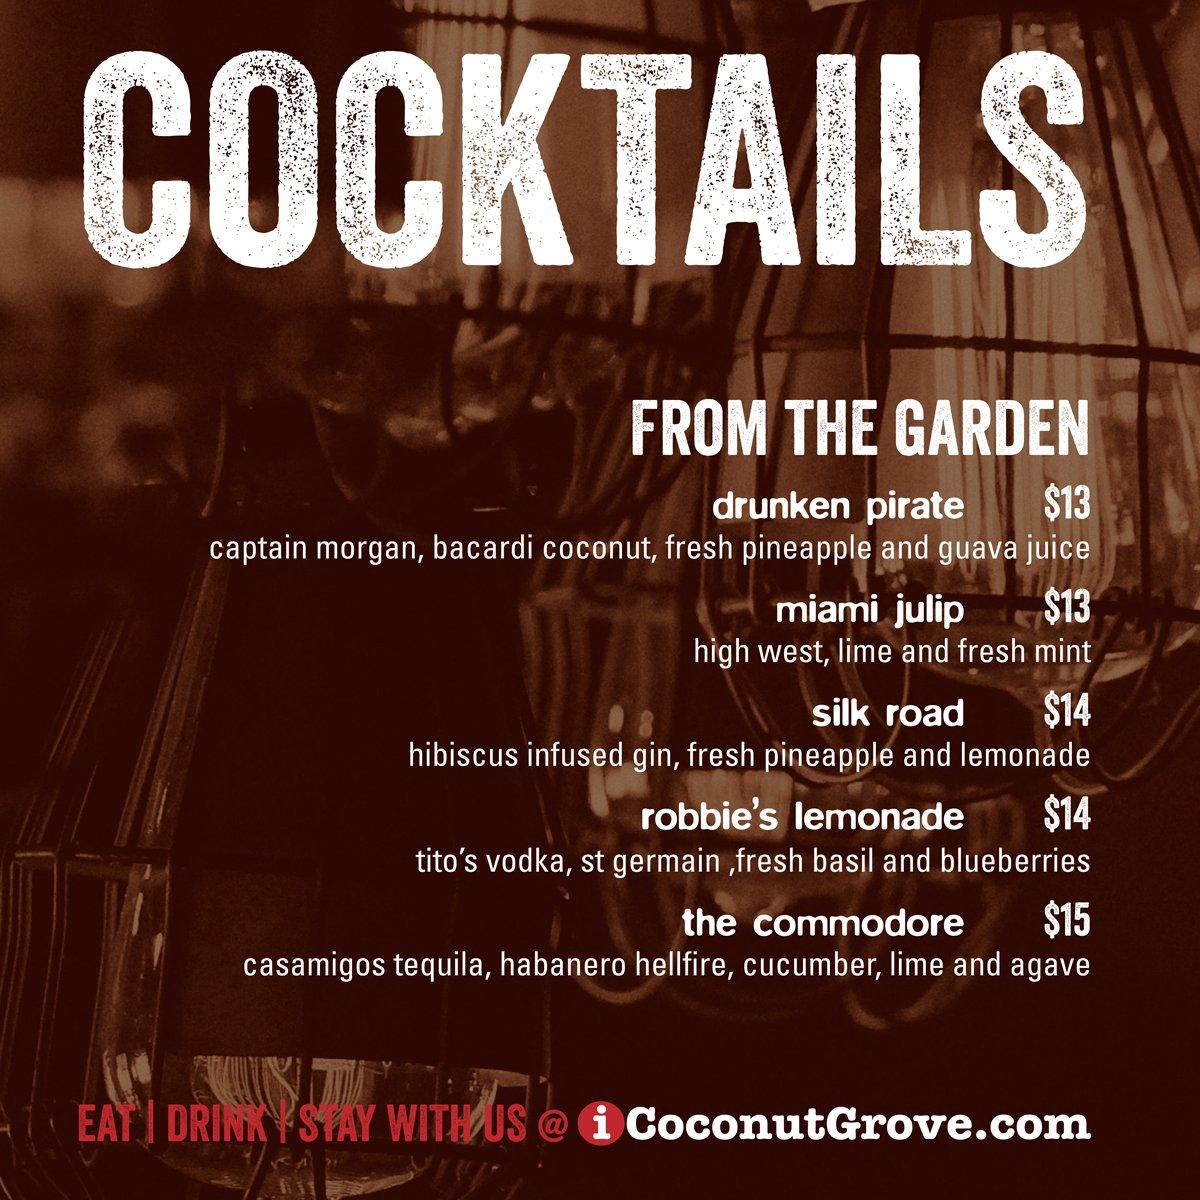 CocktailMenu 2019 4